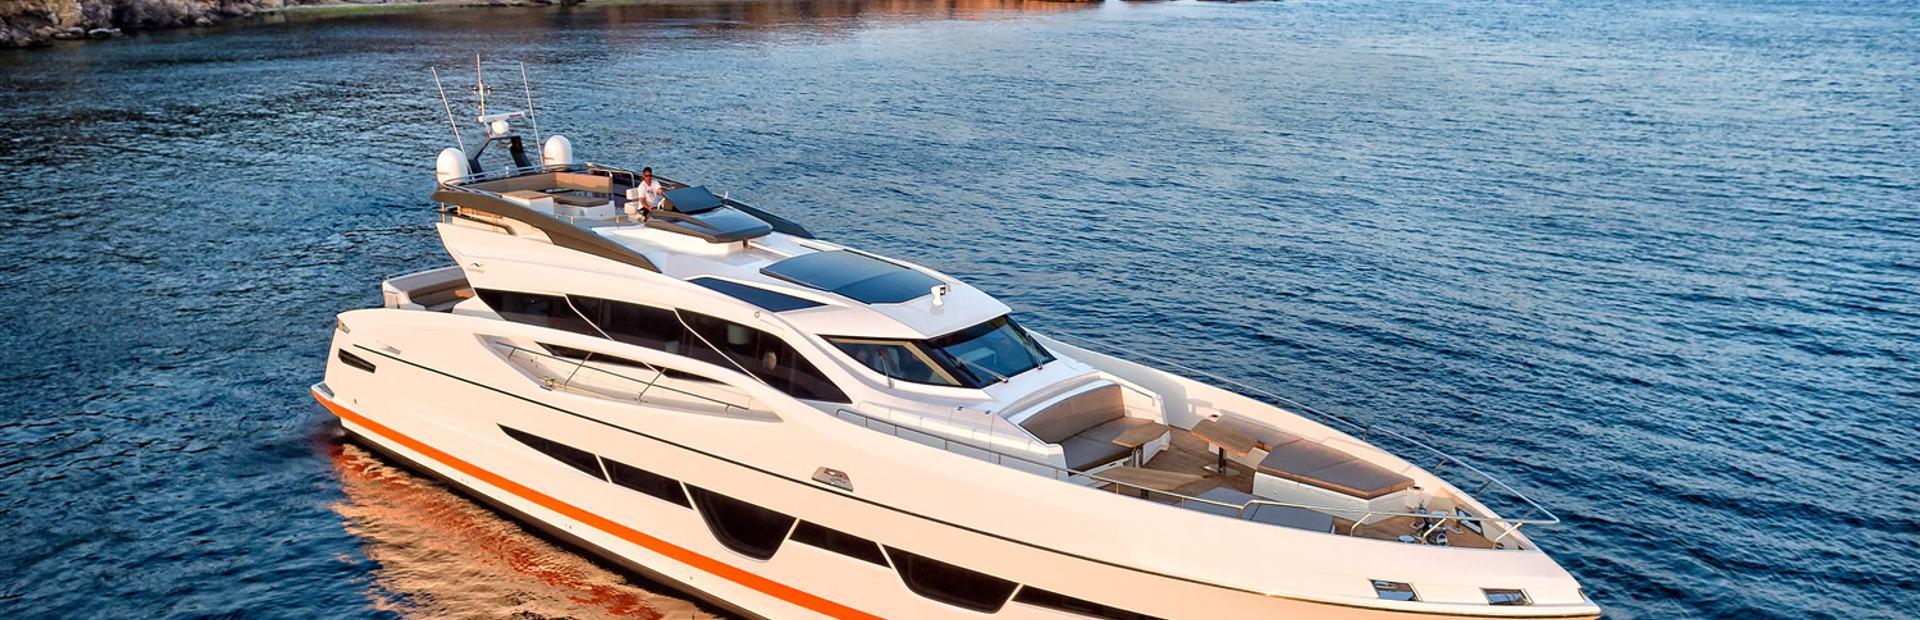 105 Hardtop Yacht Charter